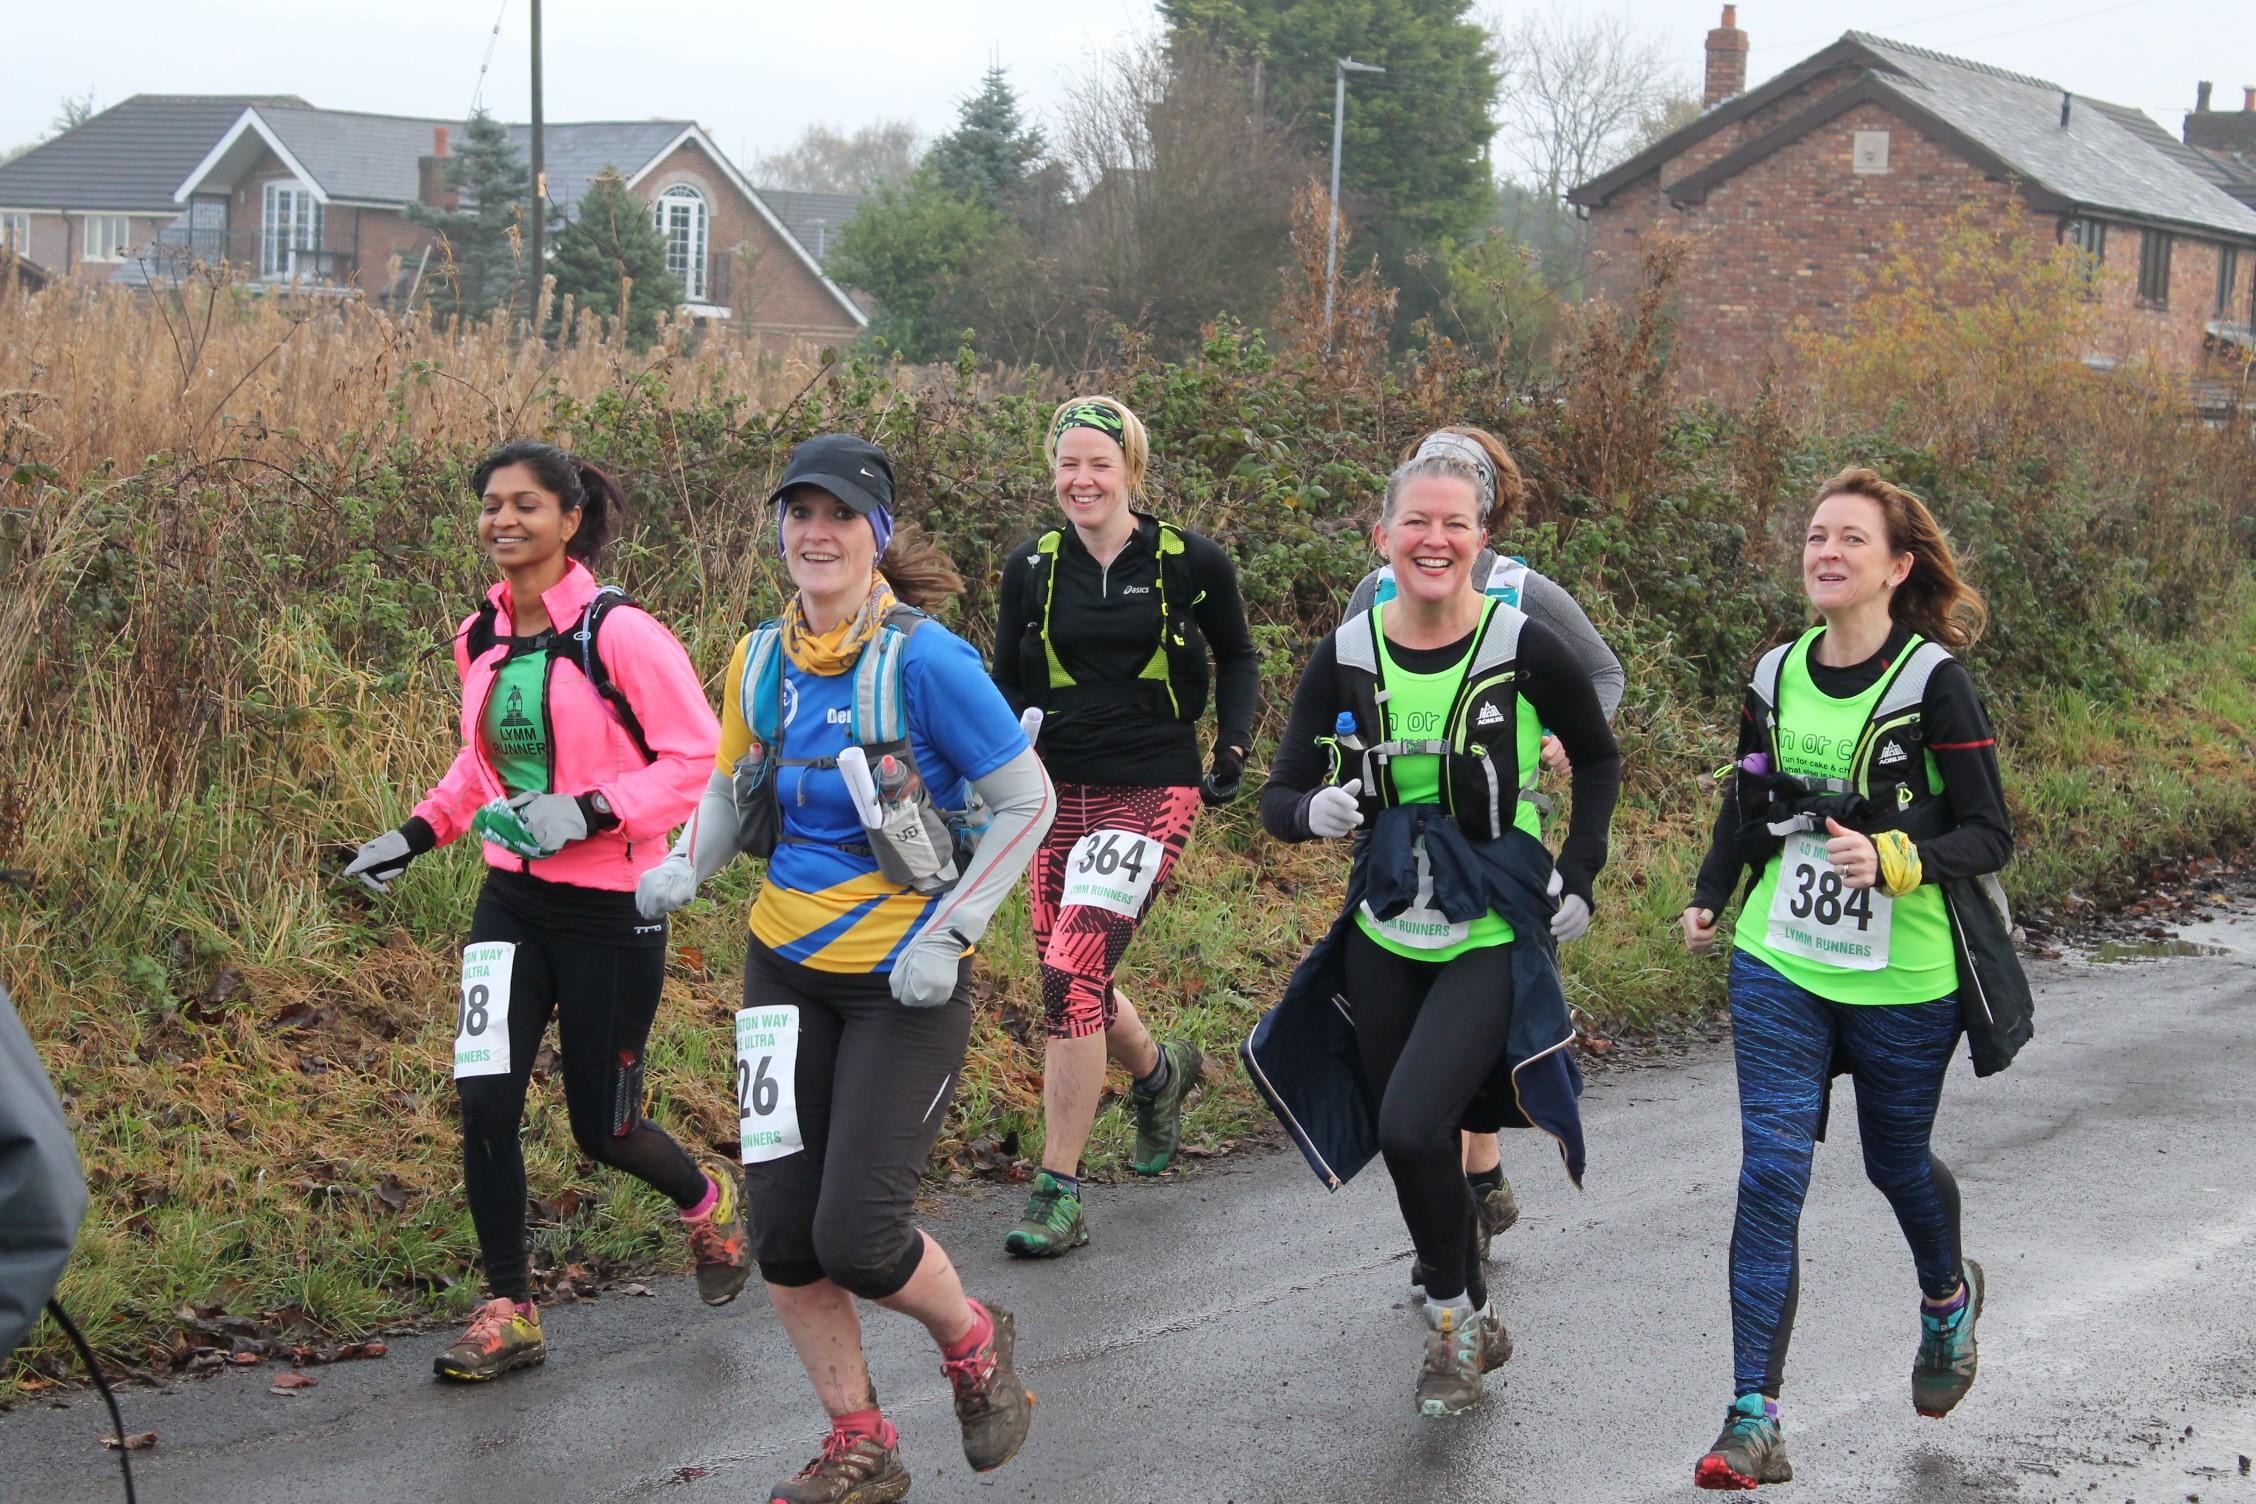 Warrington Way Group run